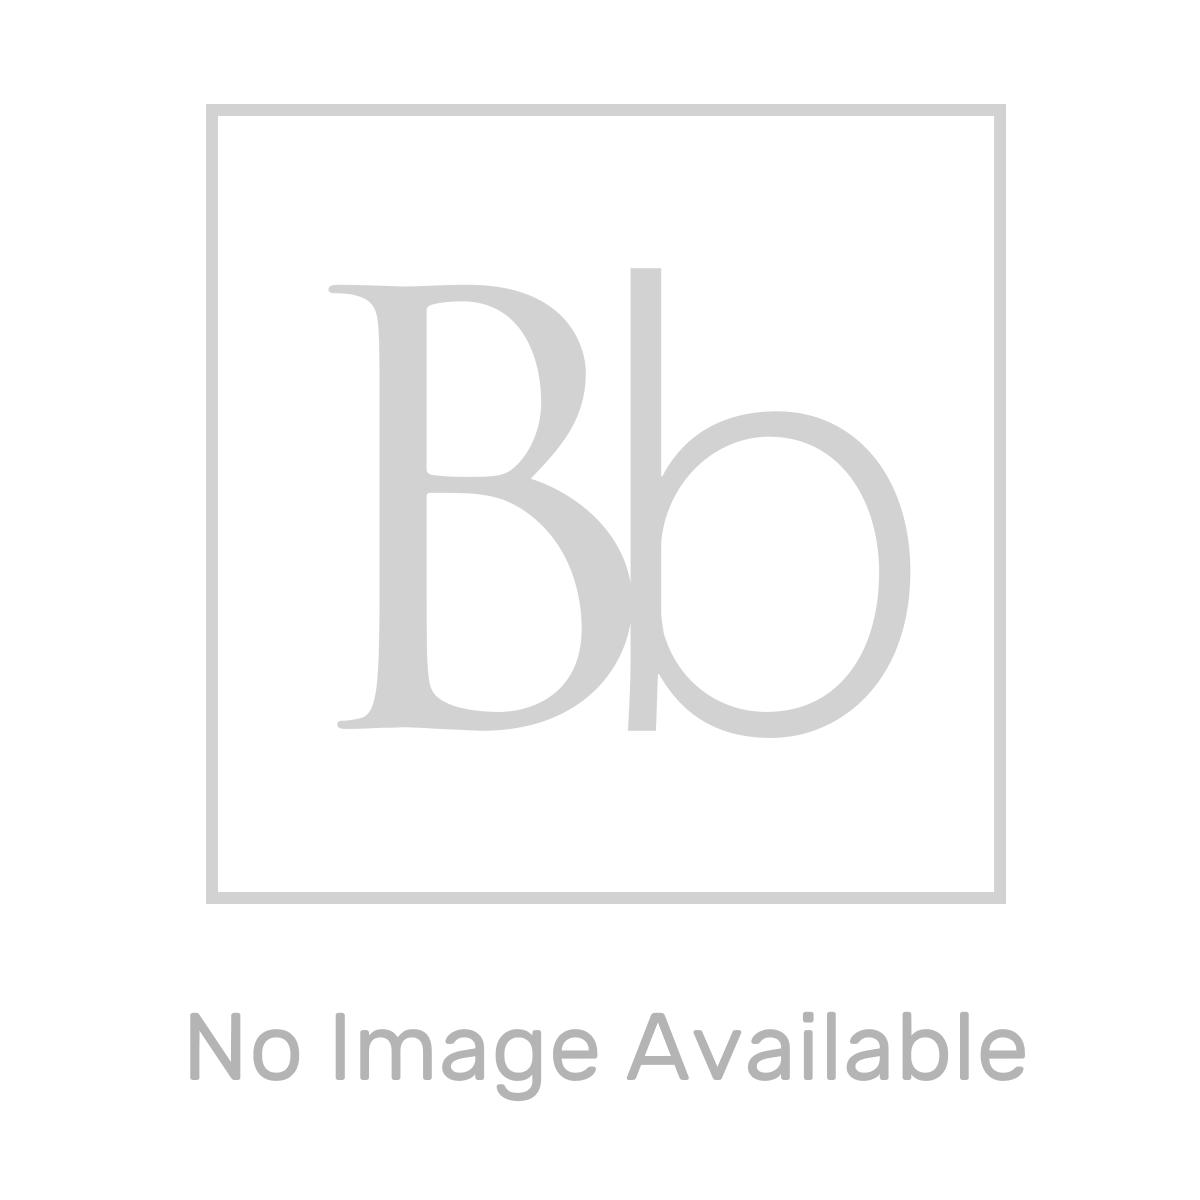 RAK Concealed Automatic Urinal Cistern 13.5L